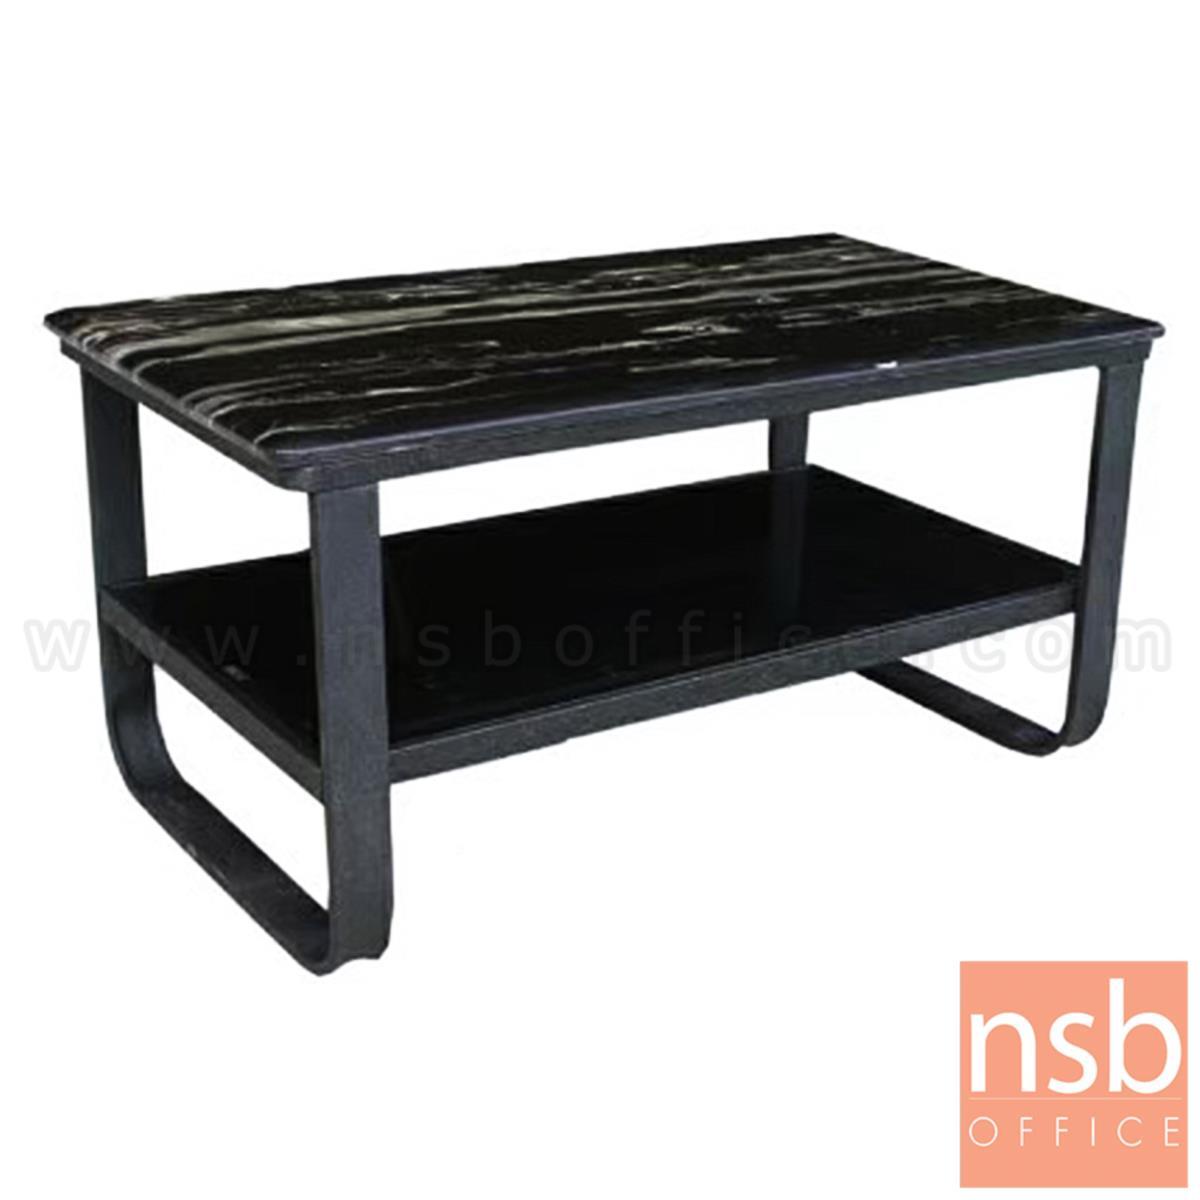 B13A298:โต๊ะกลางหน้าท็อปบนเป็นหิน ล่างเป็นกระจก รุ่น Macadamia (แมคาเดเมีย) ขนาด 90W cm. โครงเหล็ก